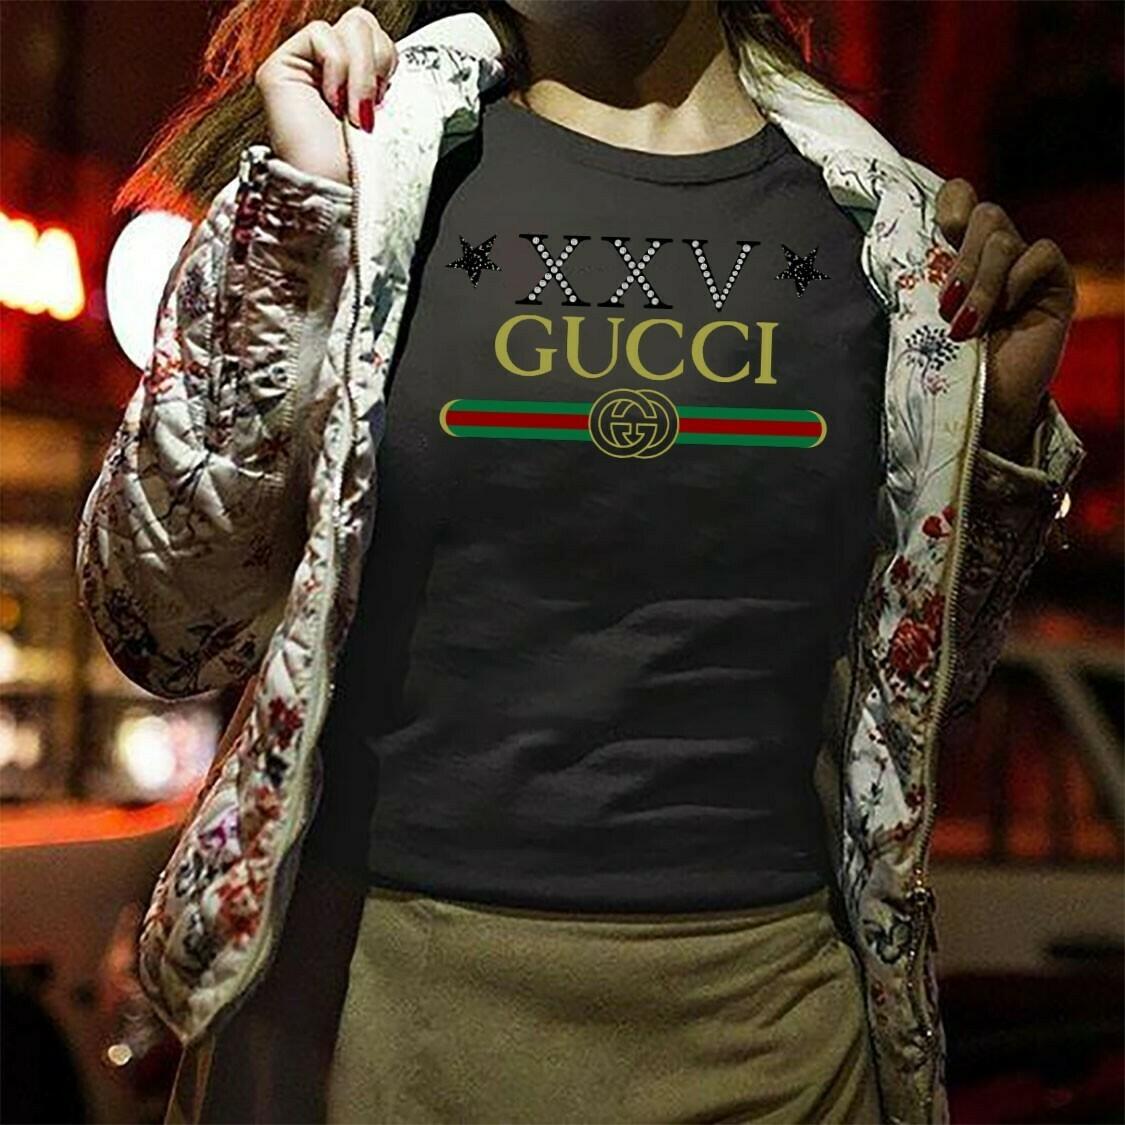 Logo Gucci, Gucci Shirt, Gucci T-shirt, Gucci Logo, Gucci Fashion shirt, Fashion shirt, Gucci Design shirt,Snake Gucci vintage shirt Long Sleeve Sweatshirt Hoodie Jolly Family Gifts